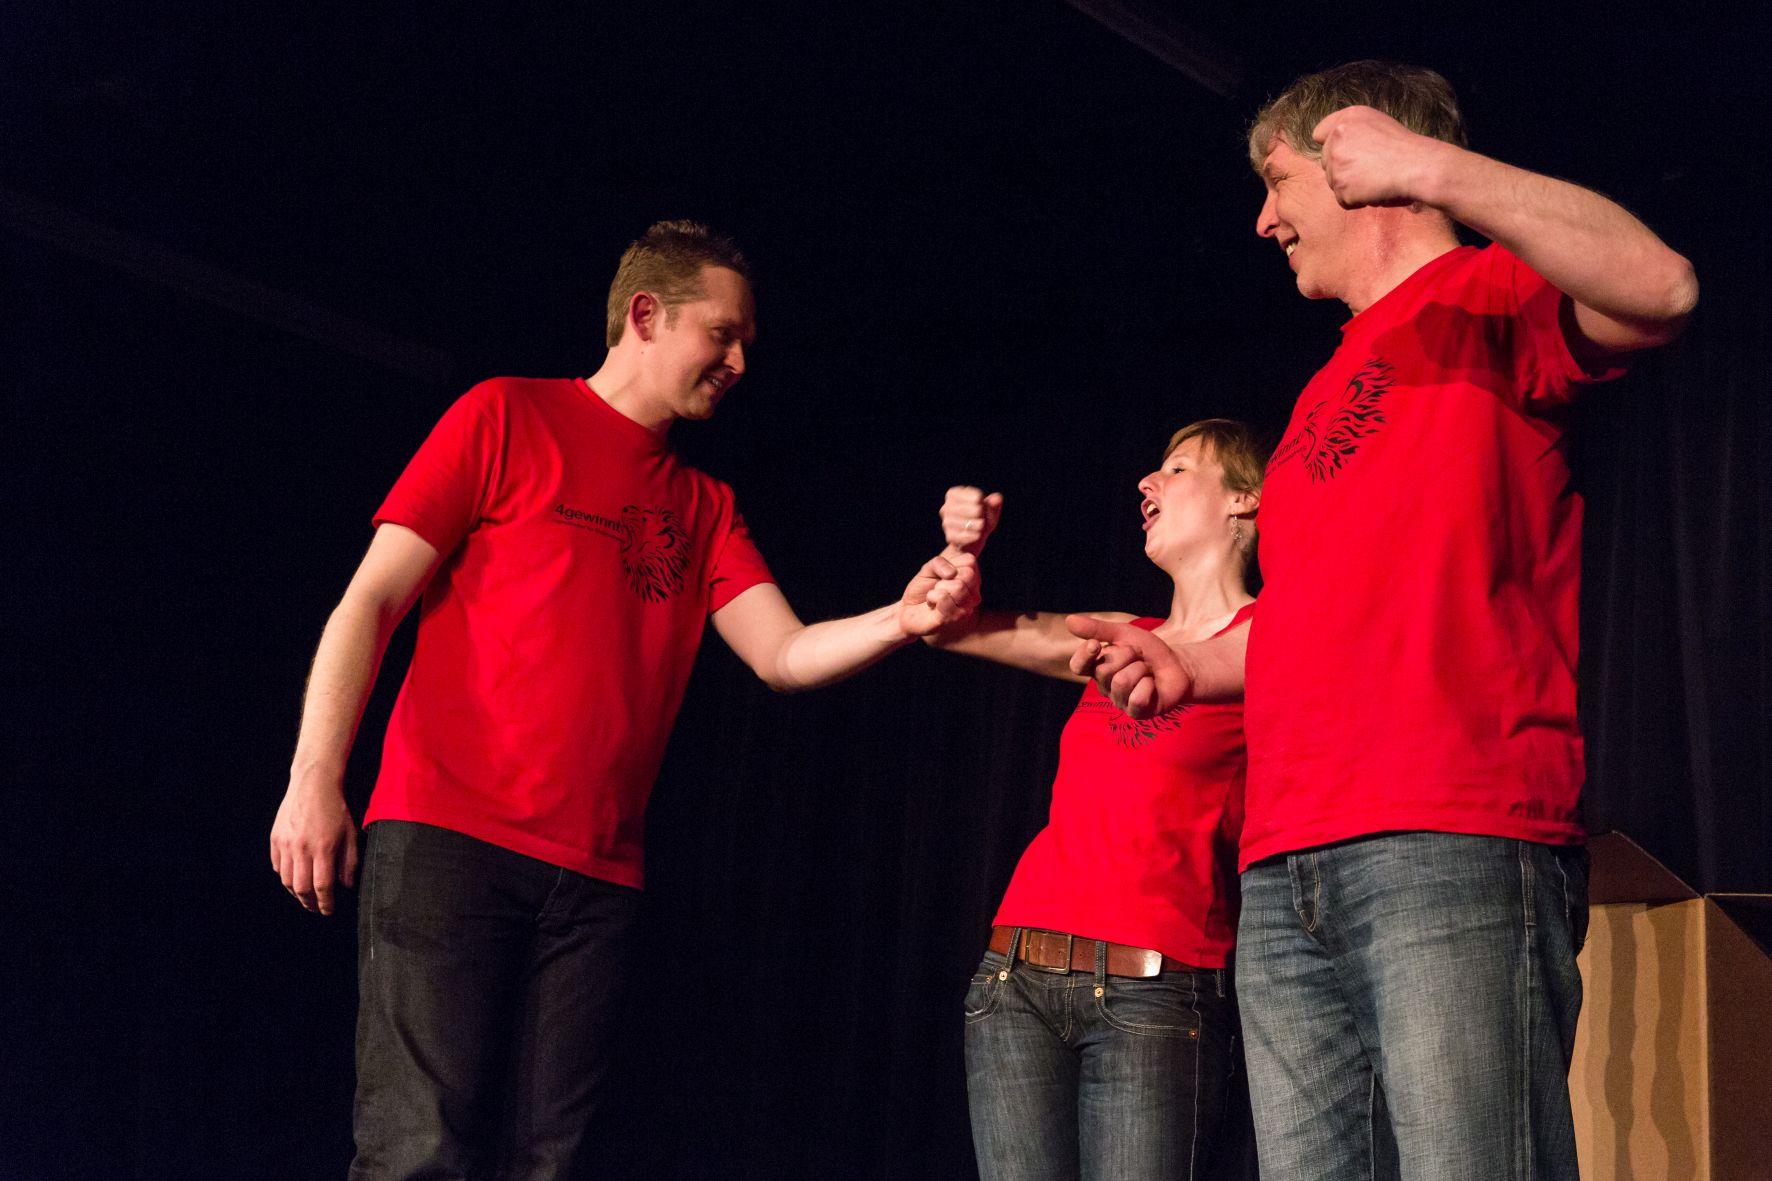 Fotogalerie Teil 2: Impro-Show im Roten Saal